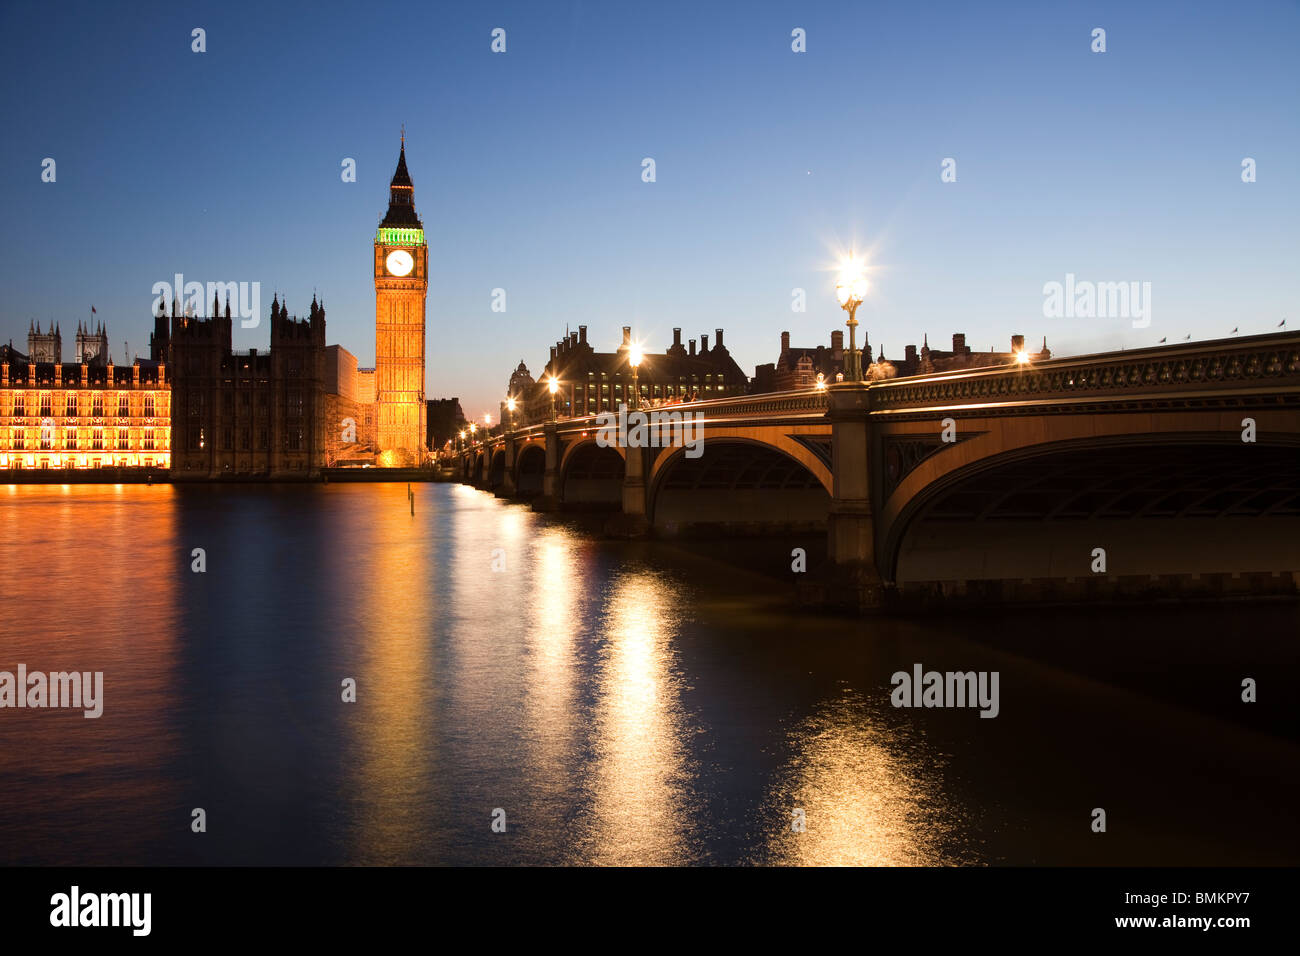 Big Ben and Westminster Bridge viewed at dusk London - Stock Image